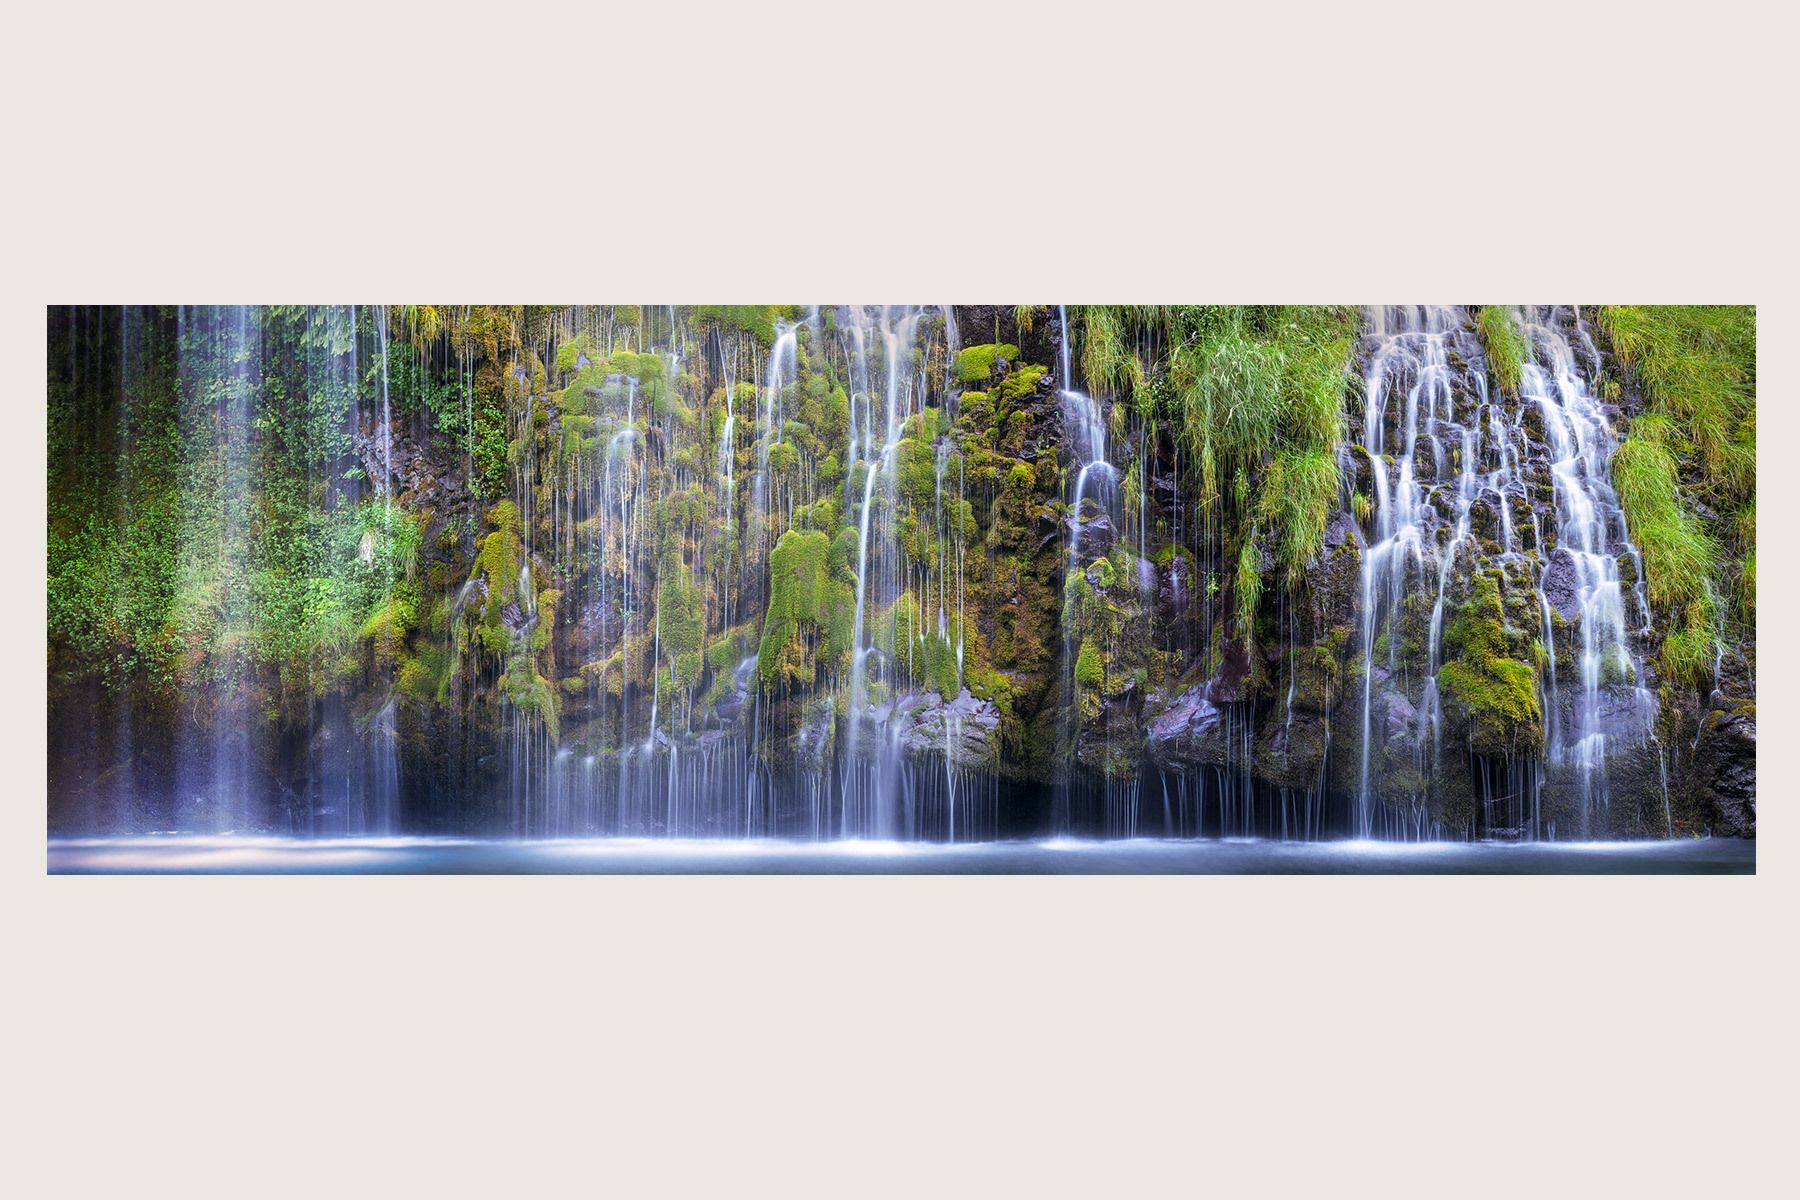 """MOSSBRAE"" Dunsmuir, California | Rivers and Waterfalls | Steve Hansen Fine Art Landscape Photography"